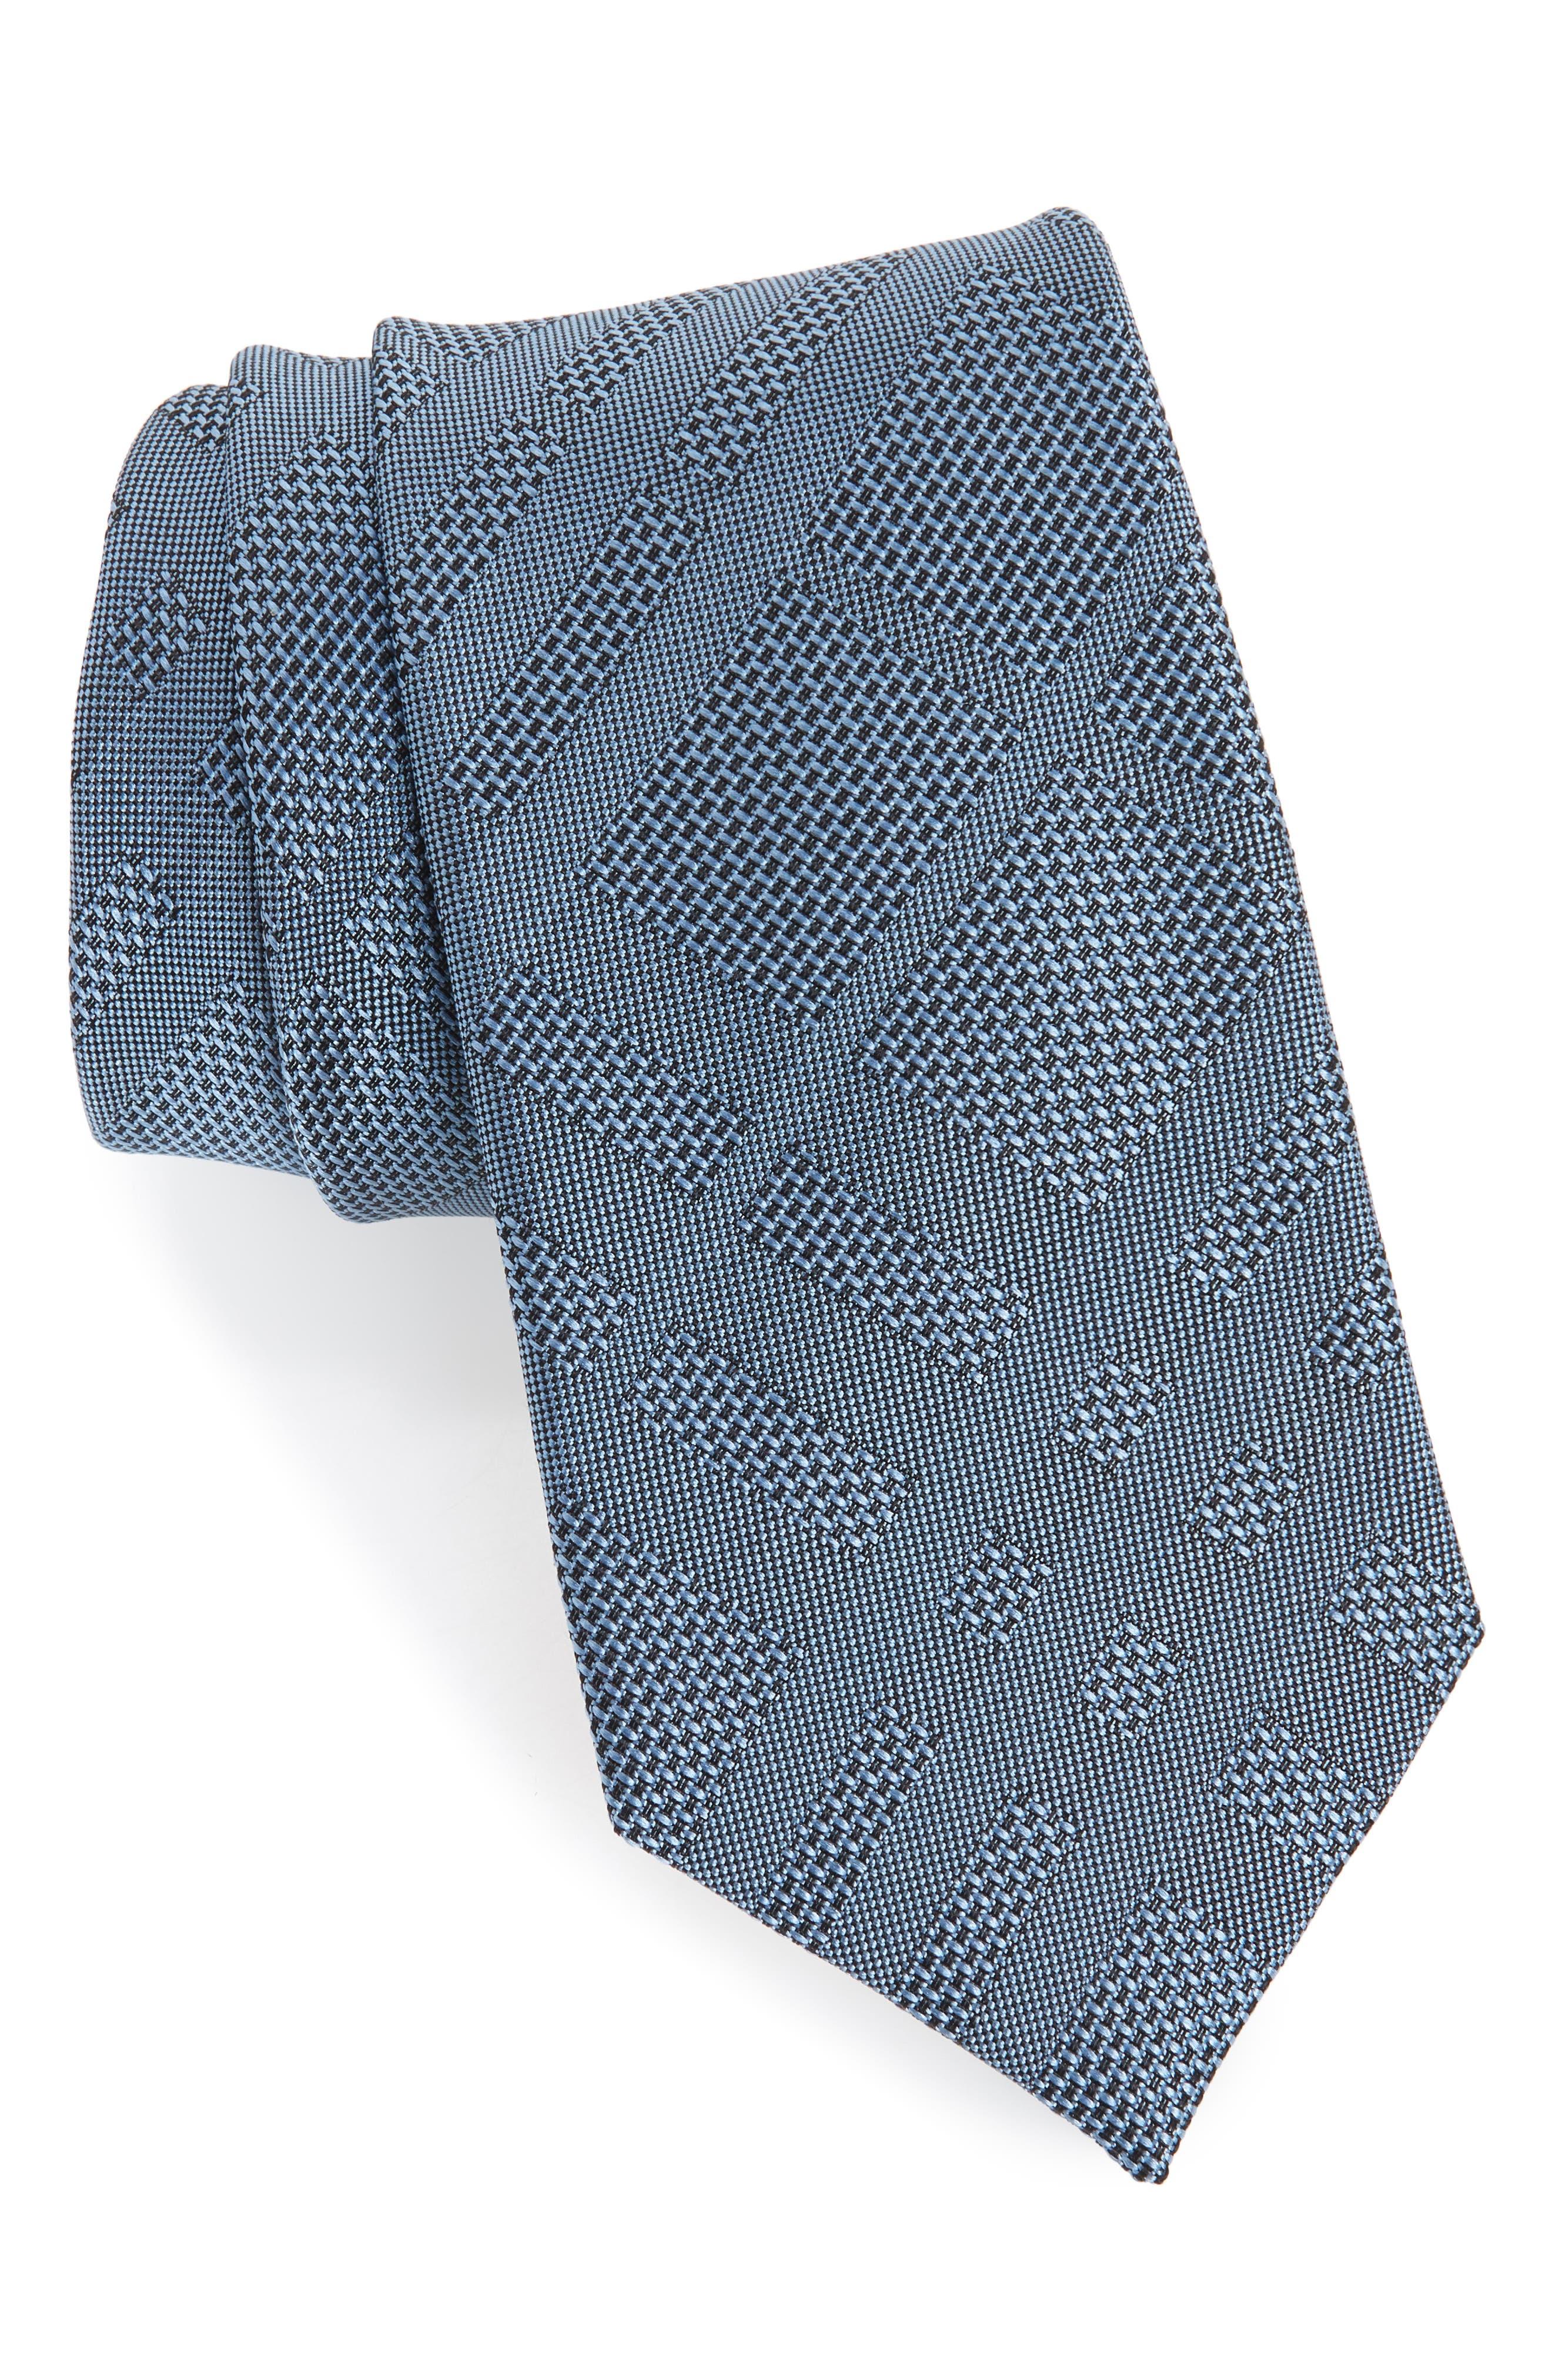 Manston Tonal Check Silk Skinny Tie,                             Main thumbnail 1, color,                             SKY BLUE